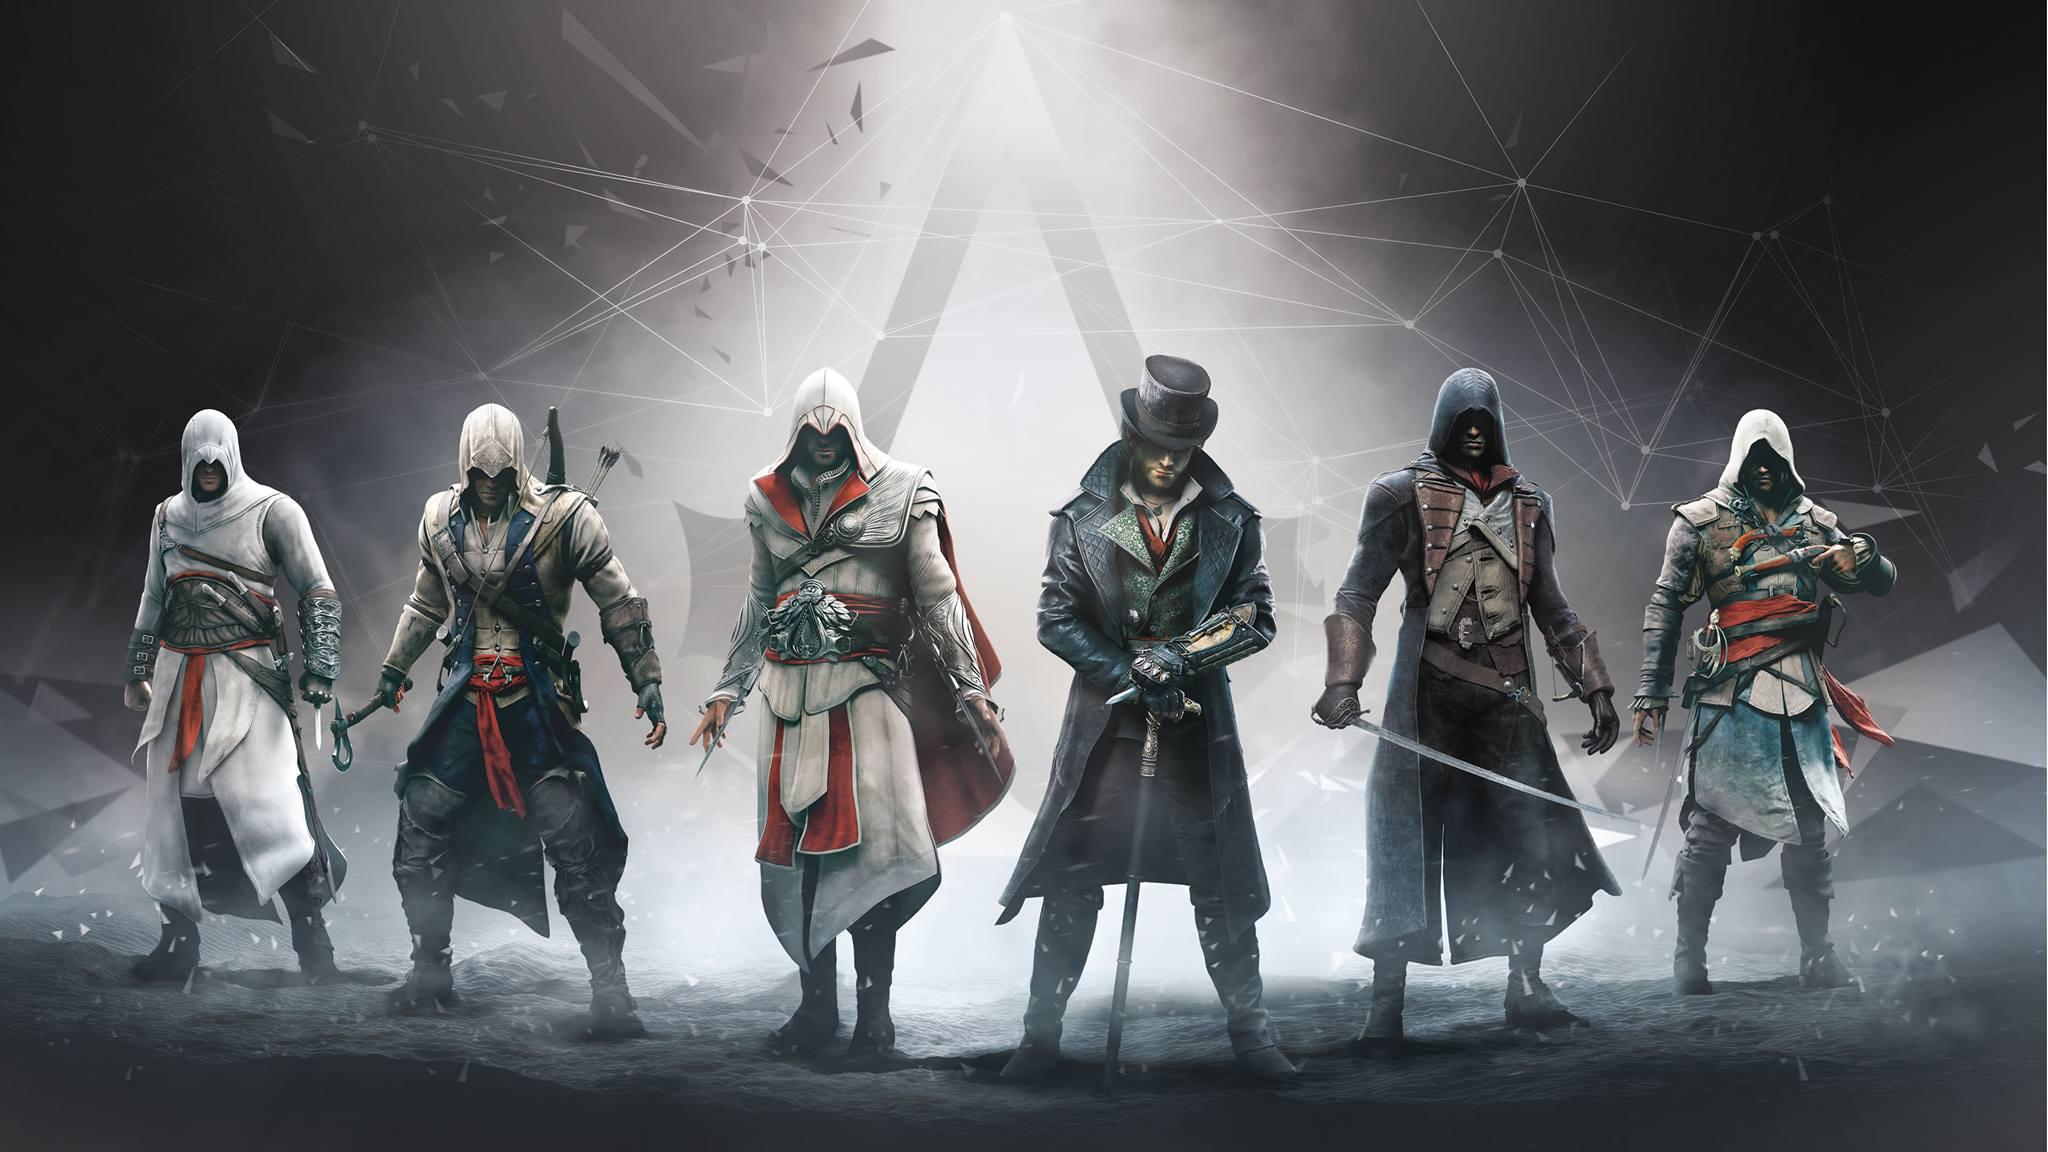 Интересности об Assassin's Creed Syndicate. - Изображение 6